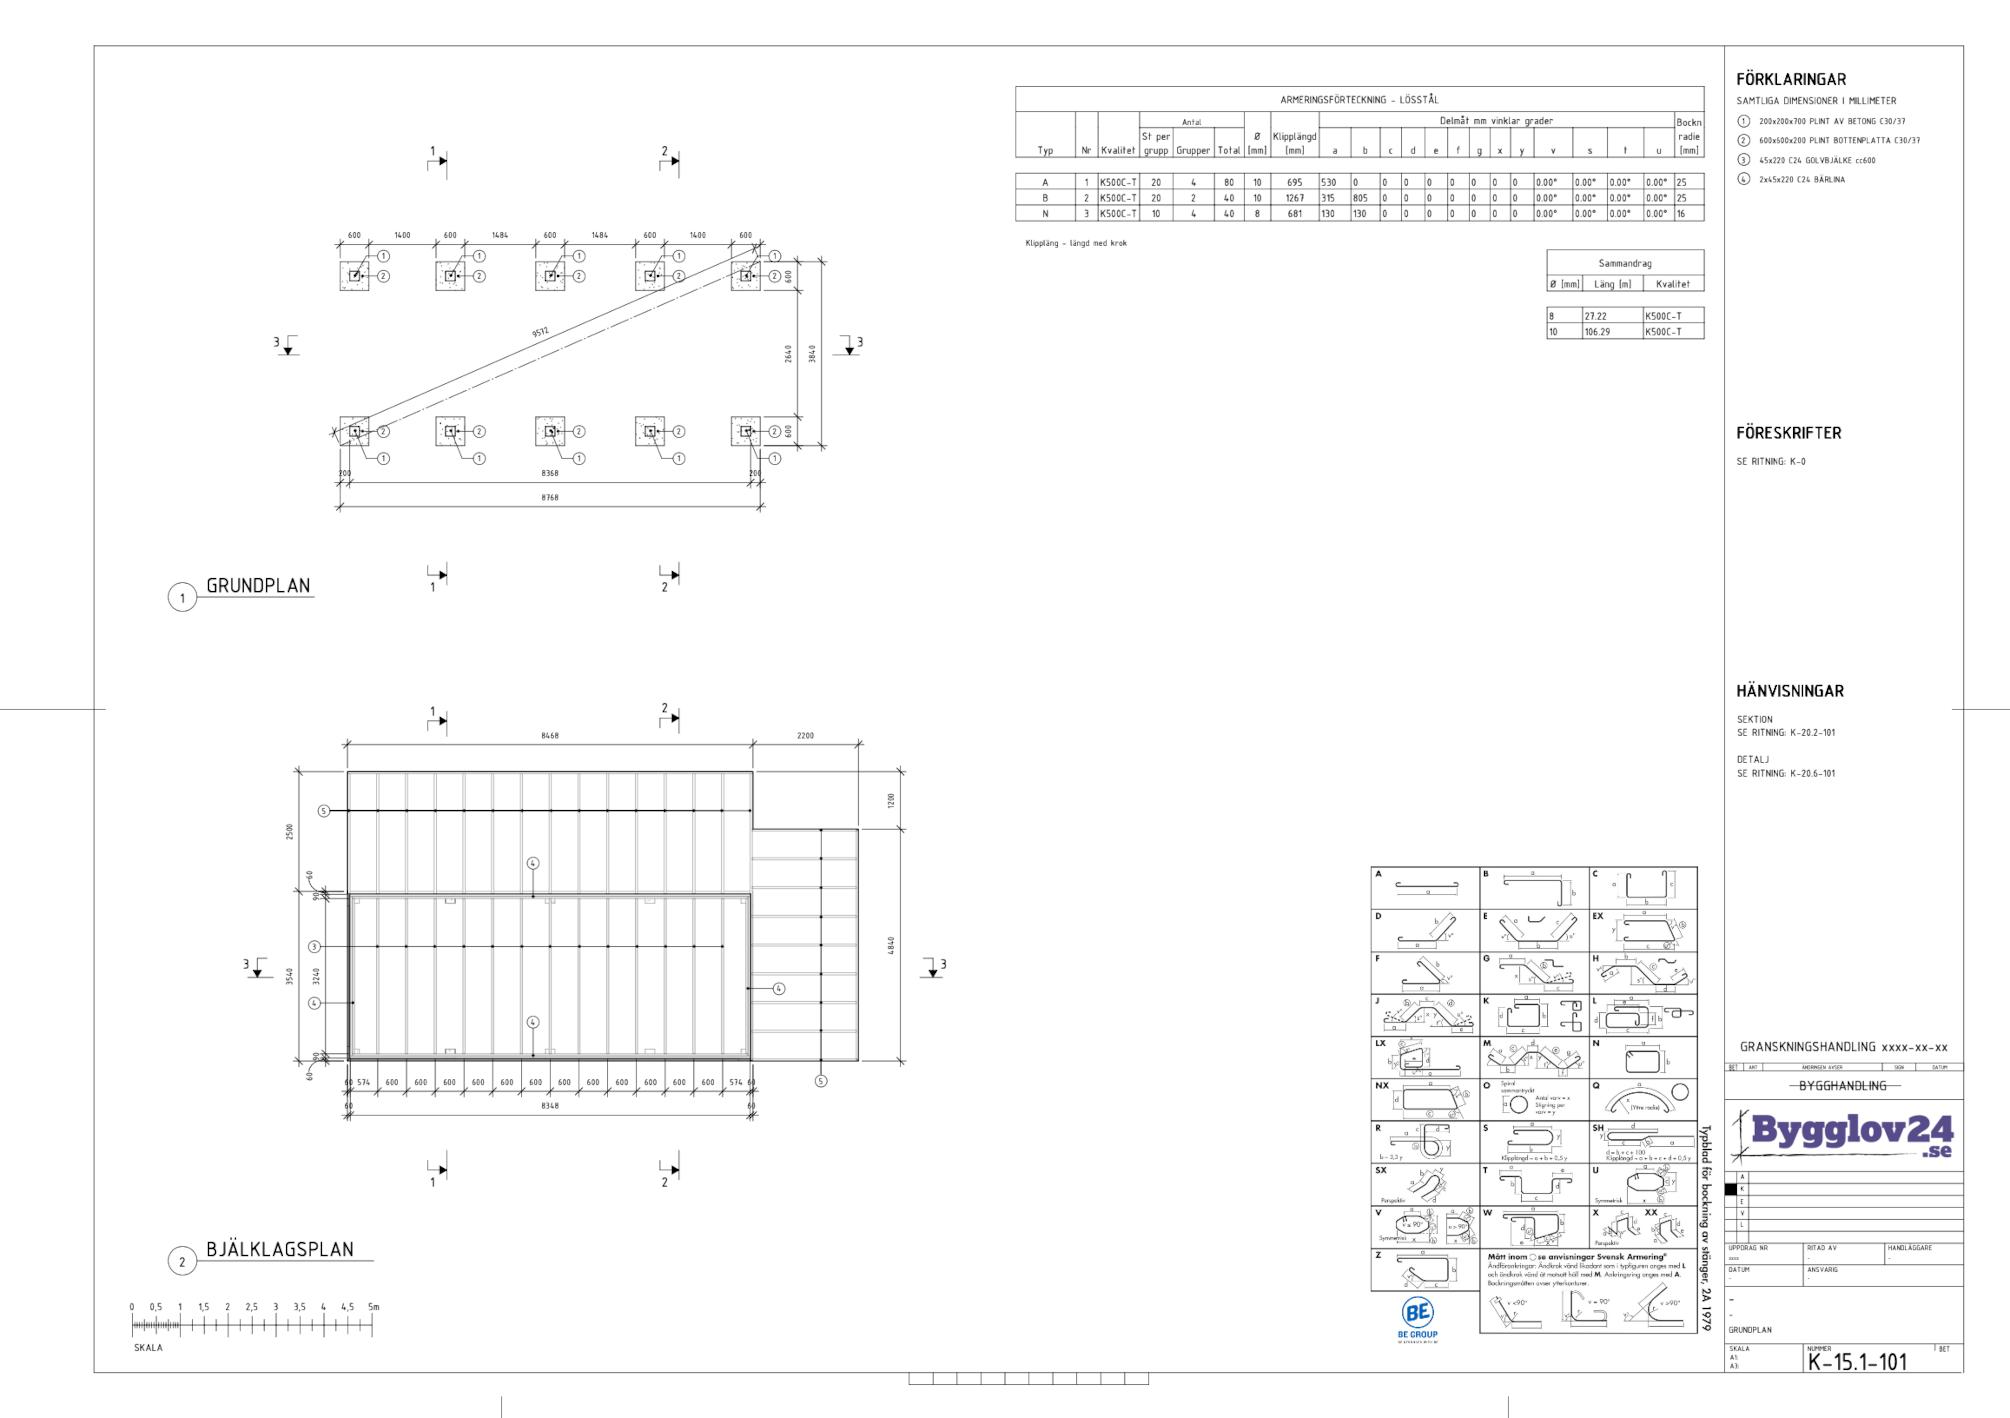 K-ritning exempel – Grundplan